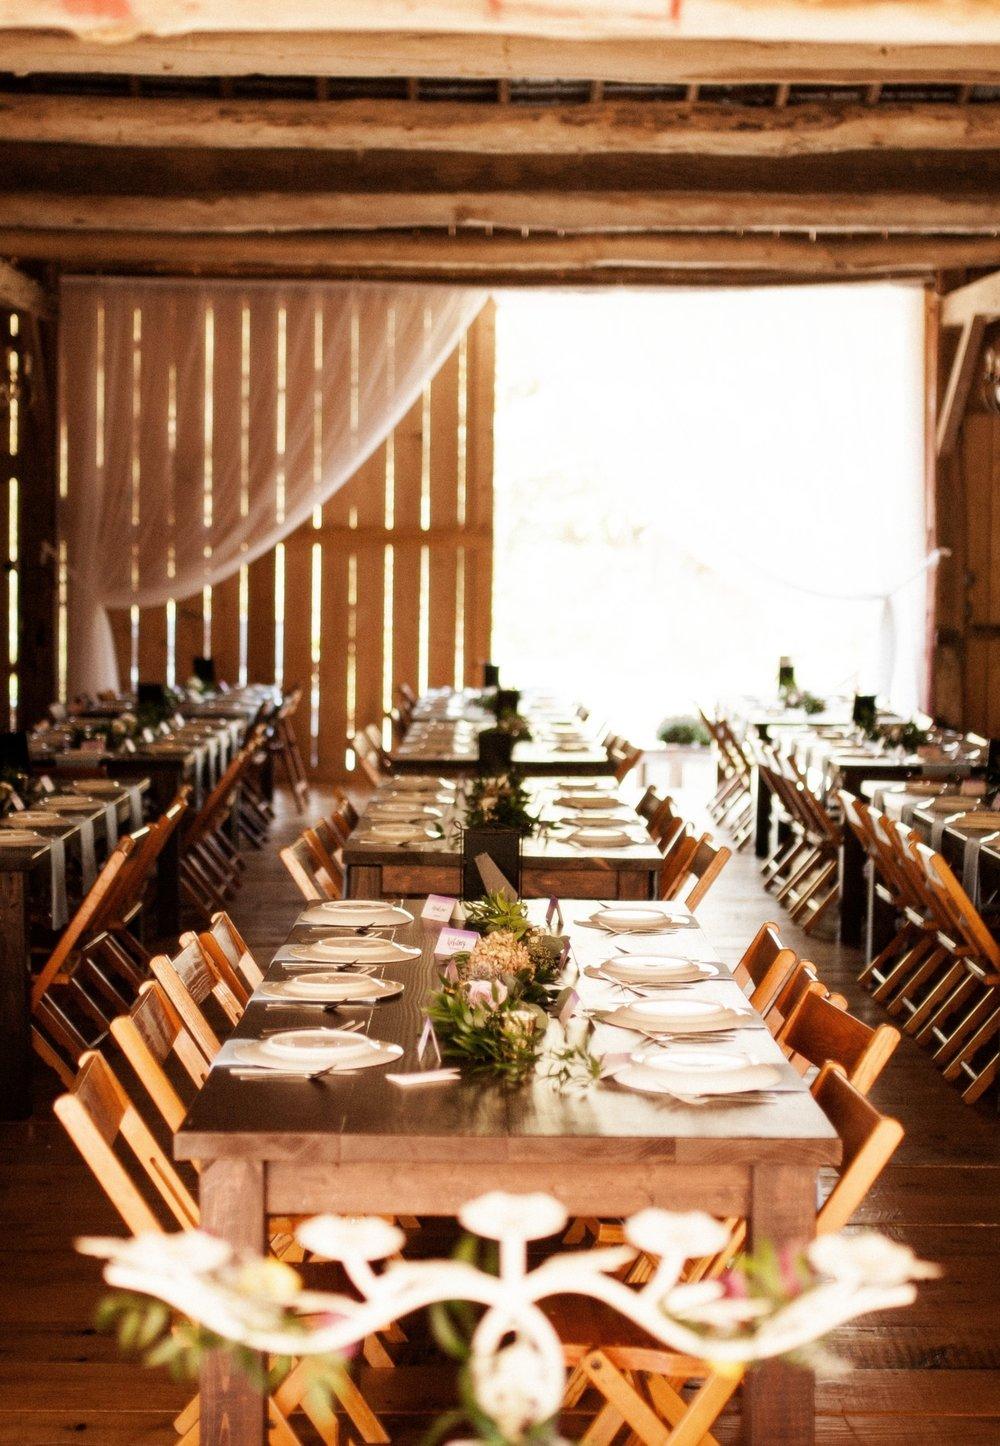 Rusiewicz Wedding311111111111111111111111.jpg